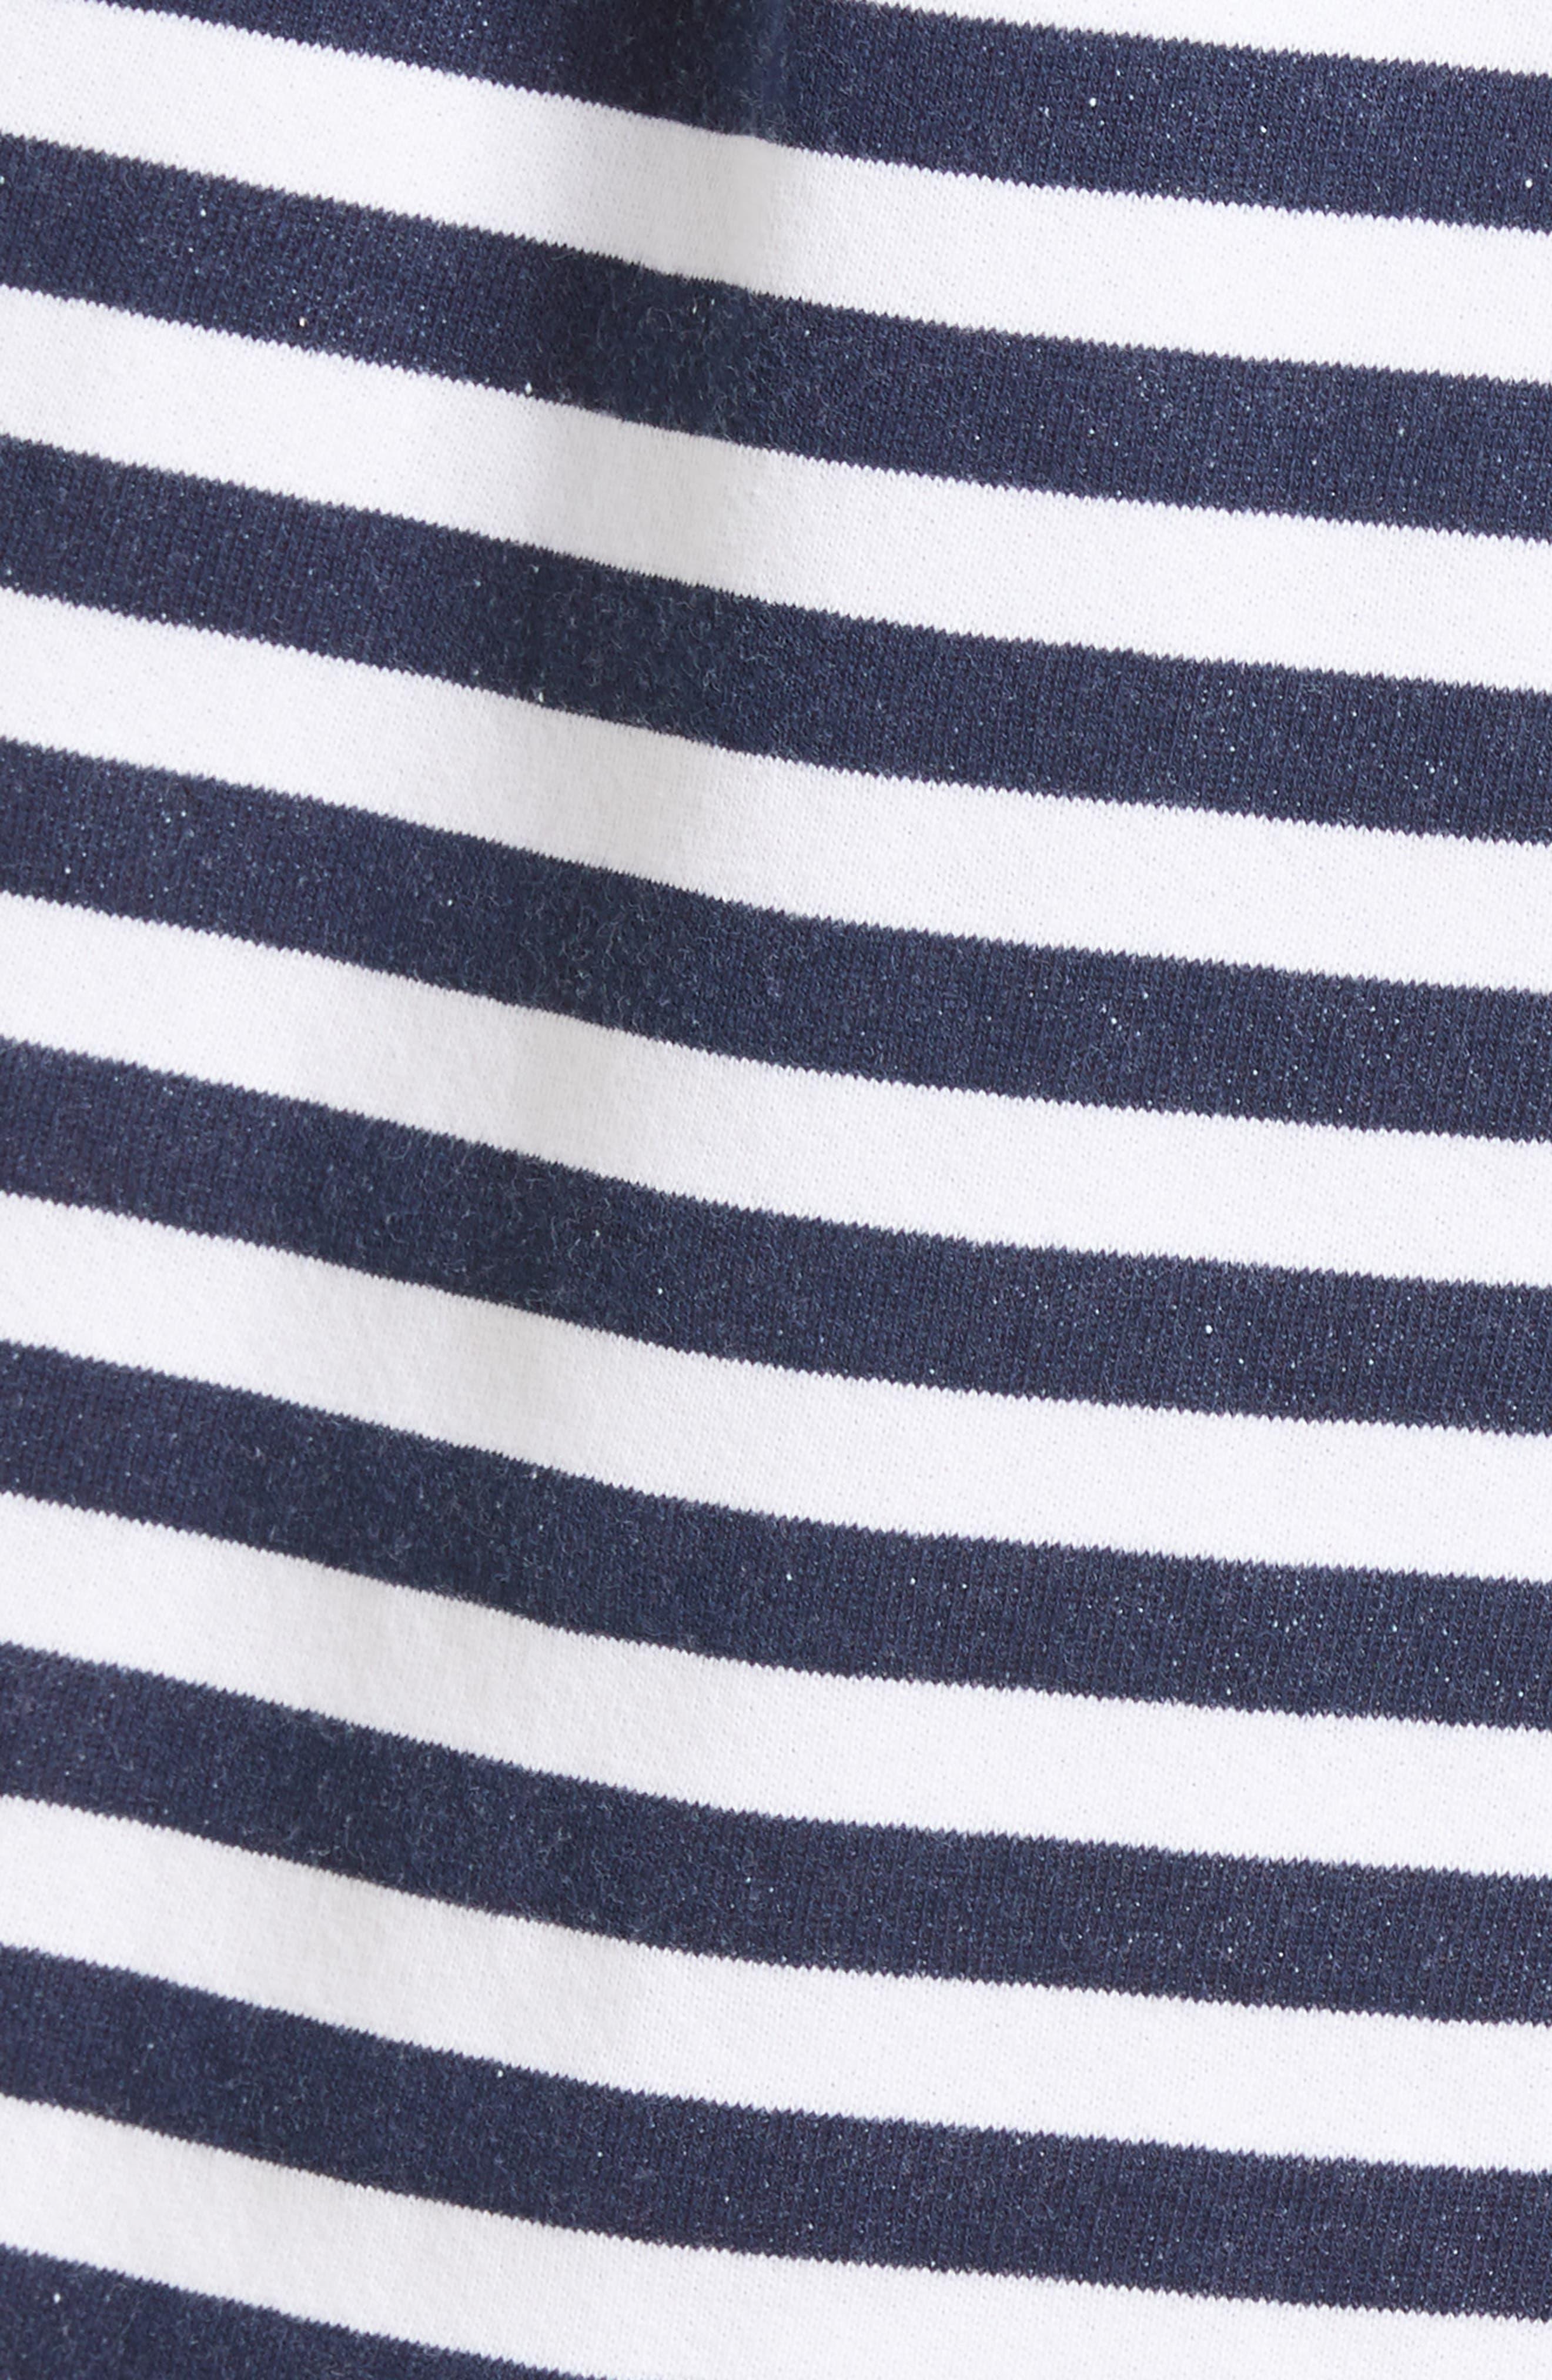 Pleat Back Minidress,                             Alternate thumbnail 5, color,                             Navy/ Ivory Stripe